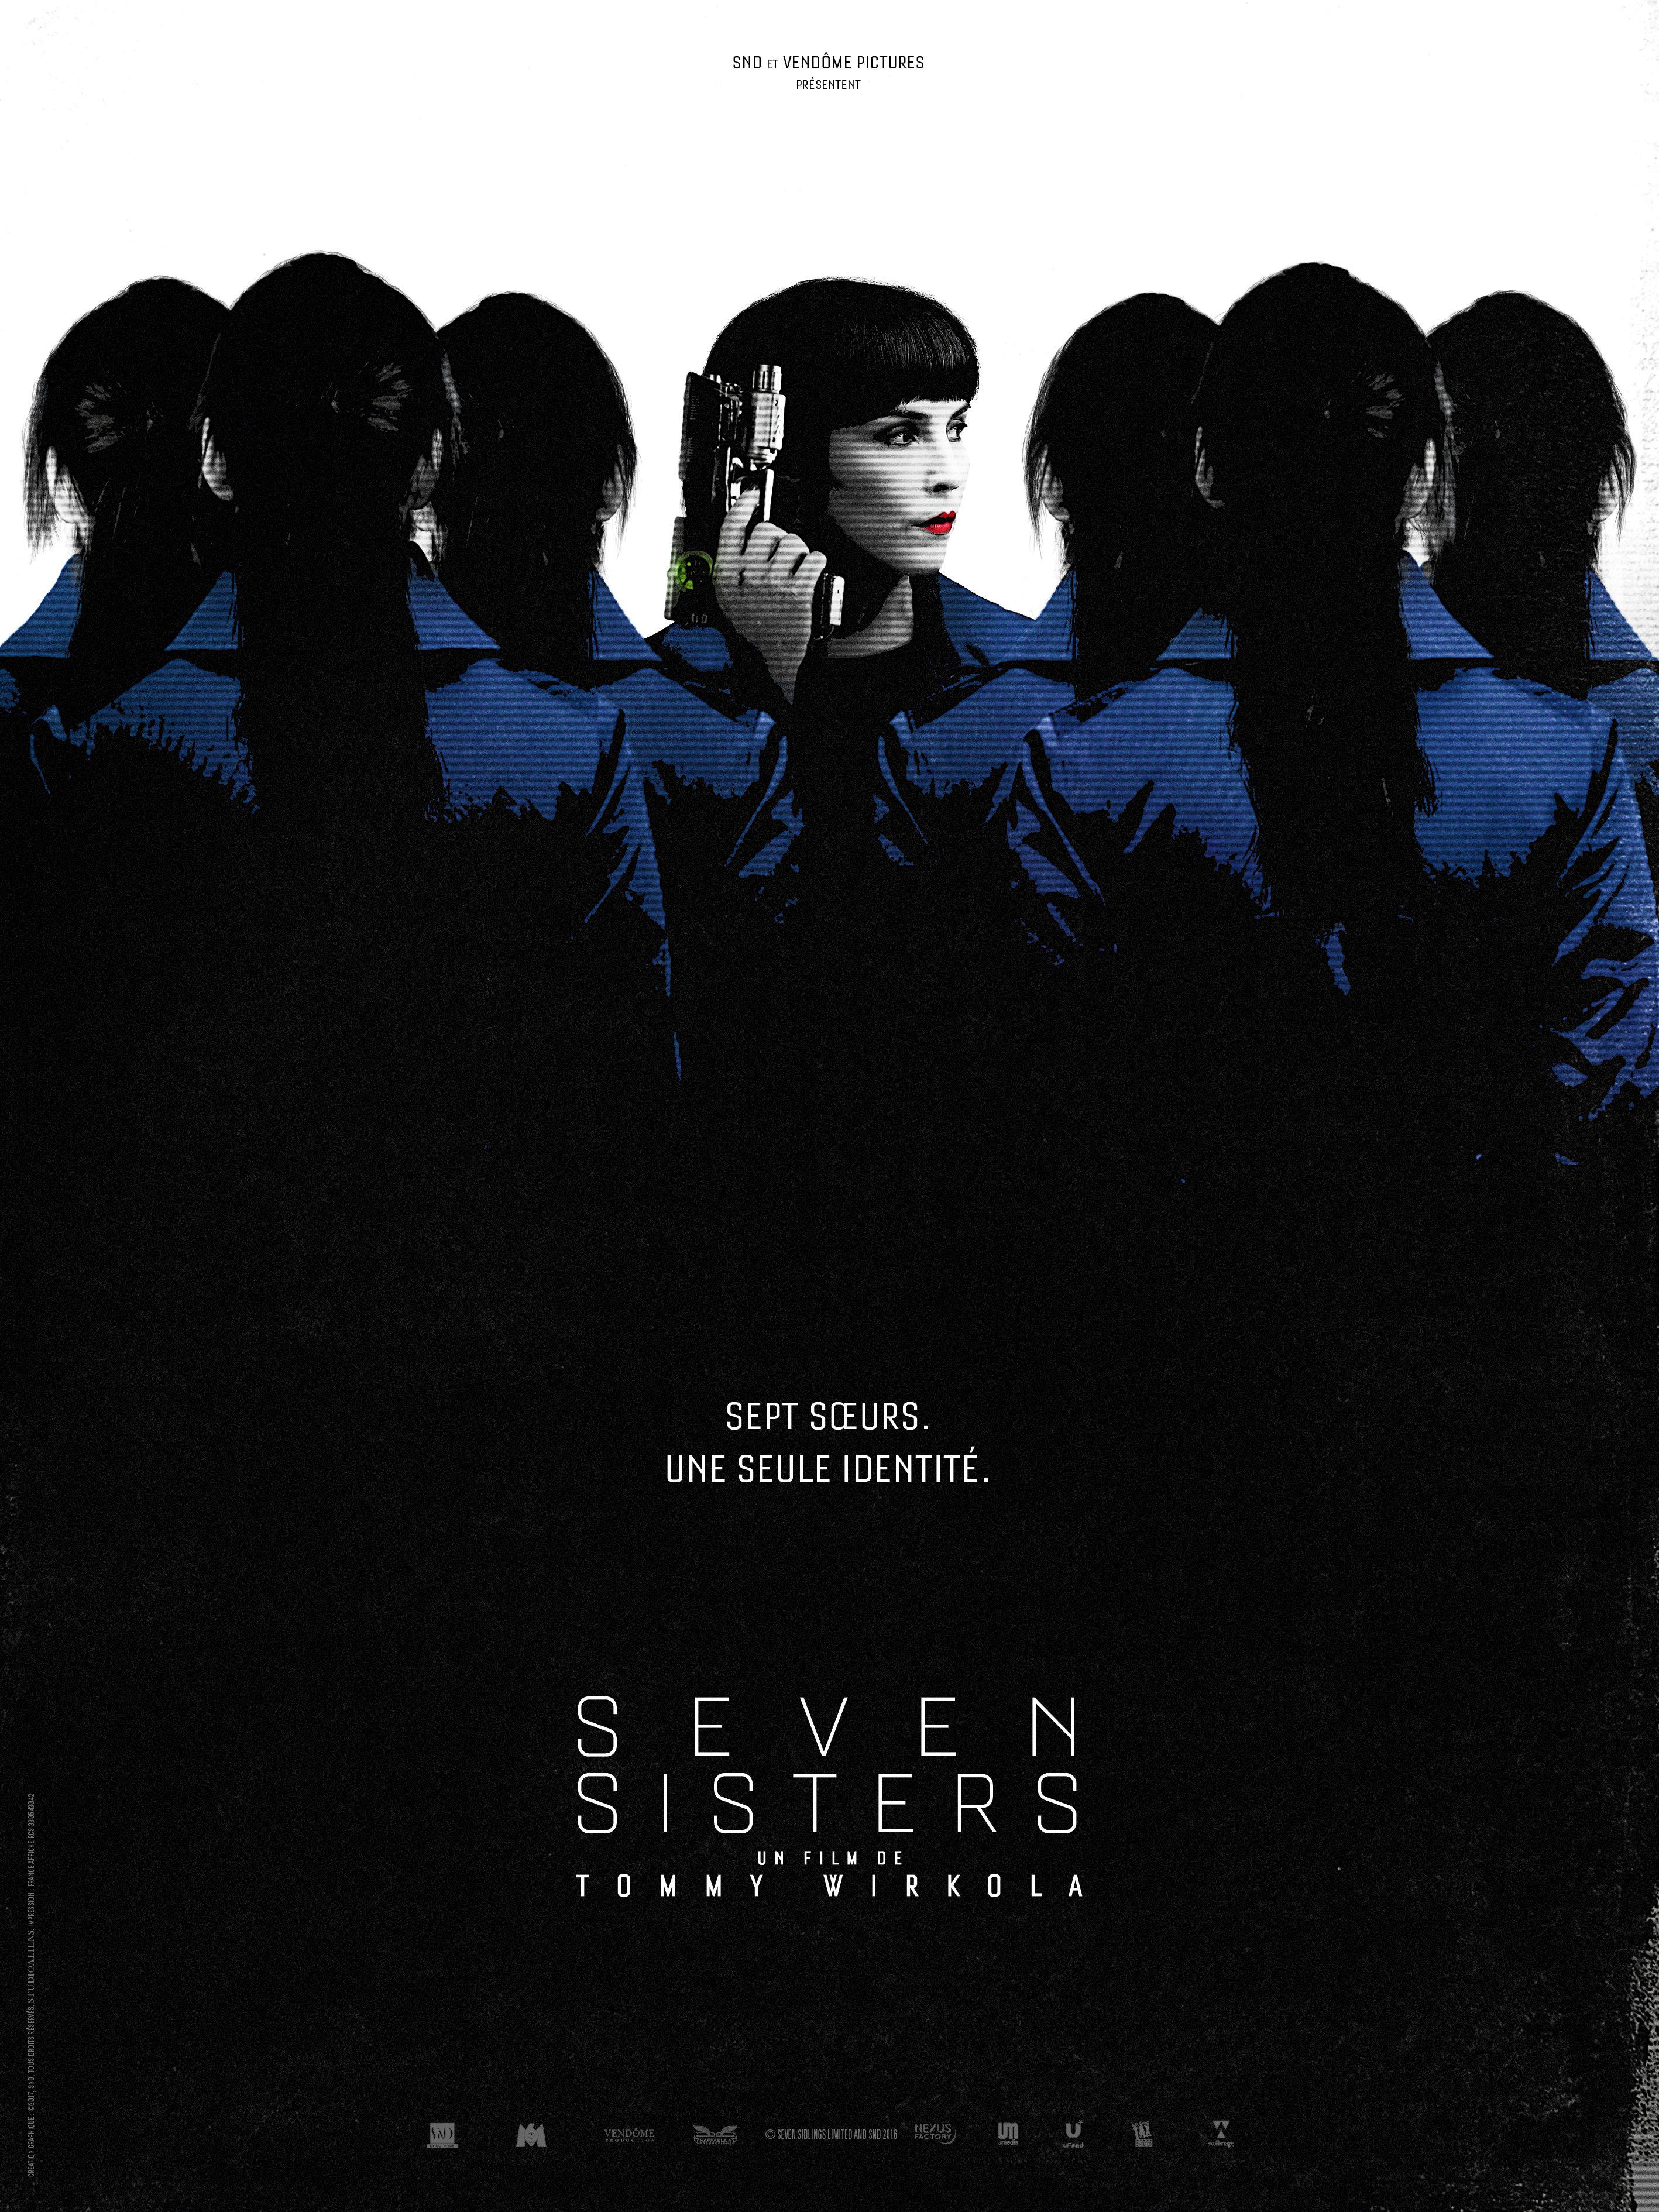 тайна семи сестер постер мультиварке готовится